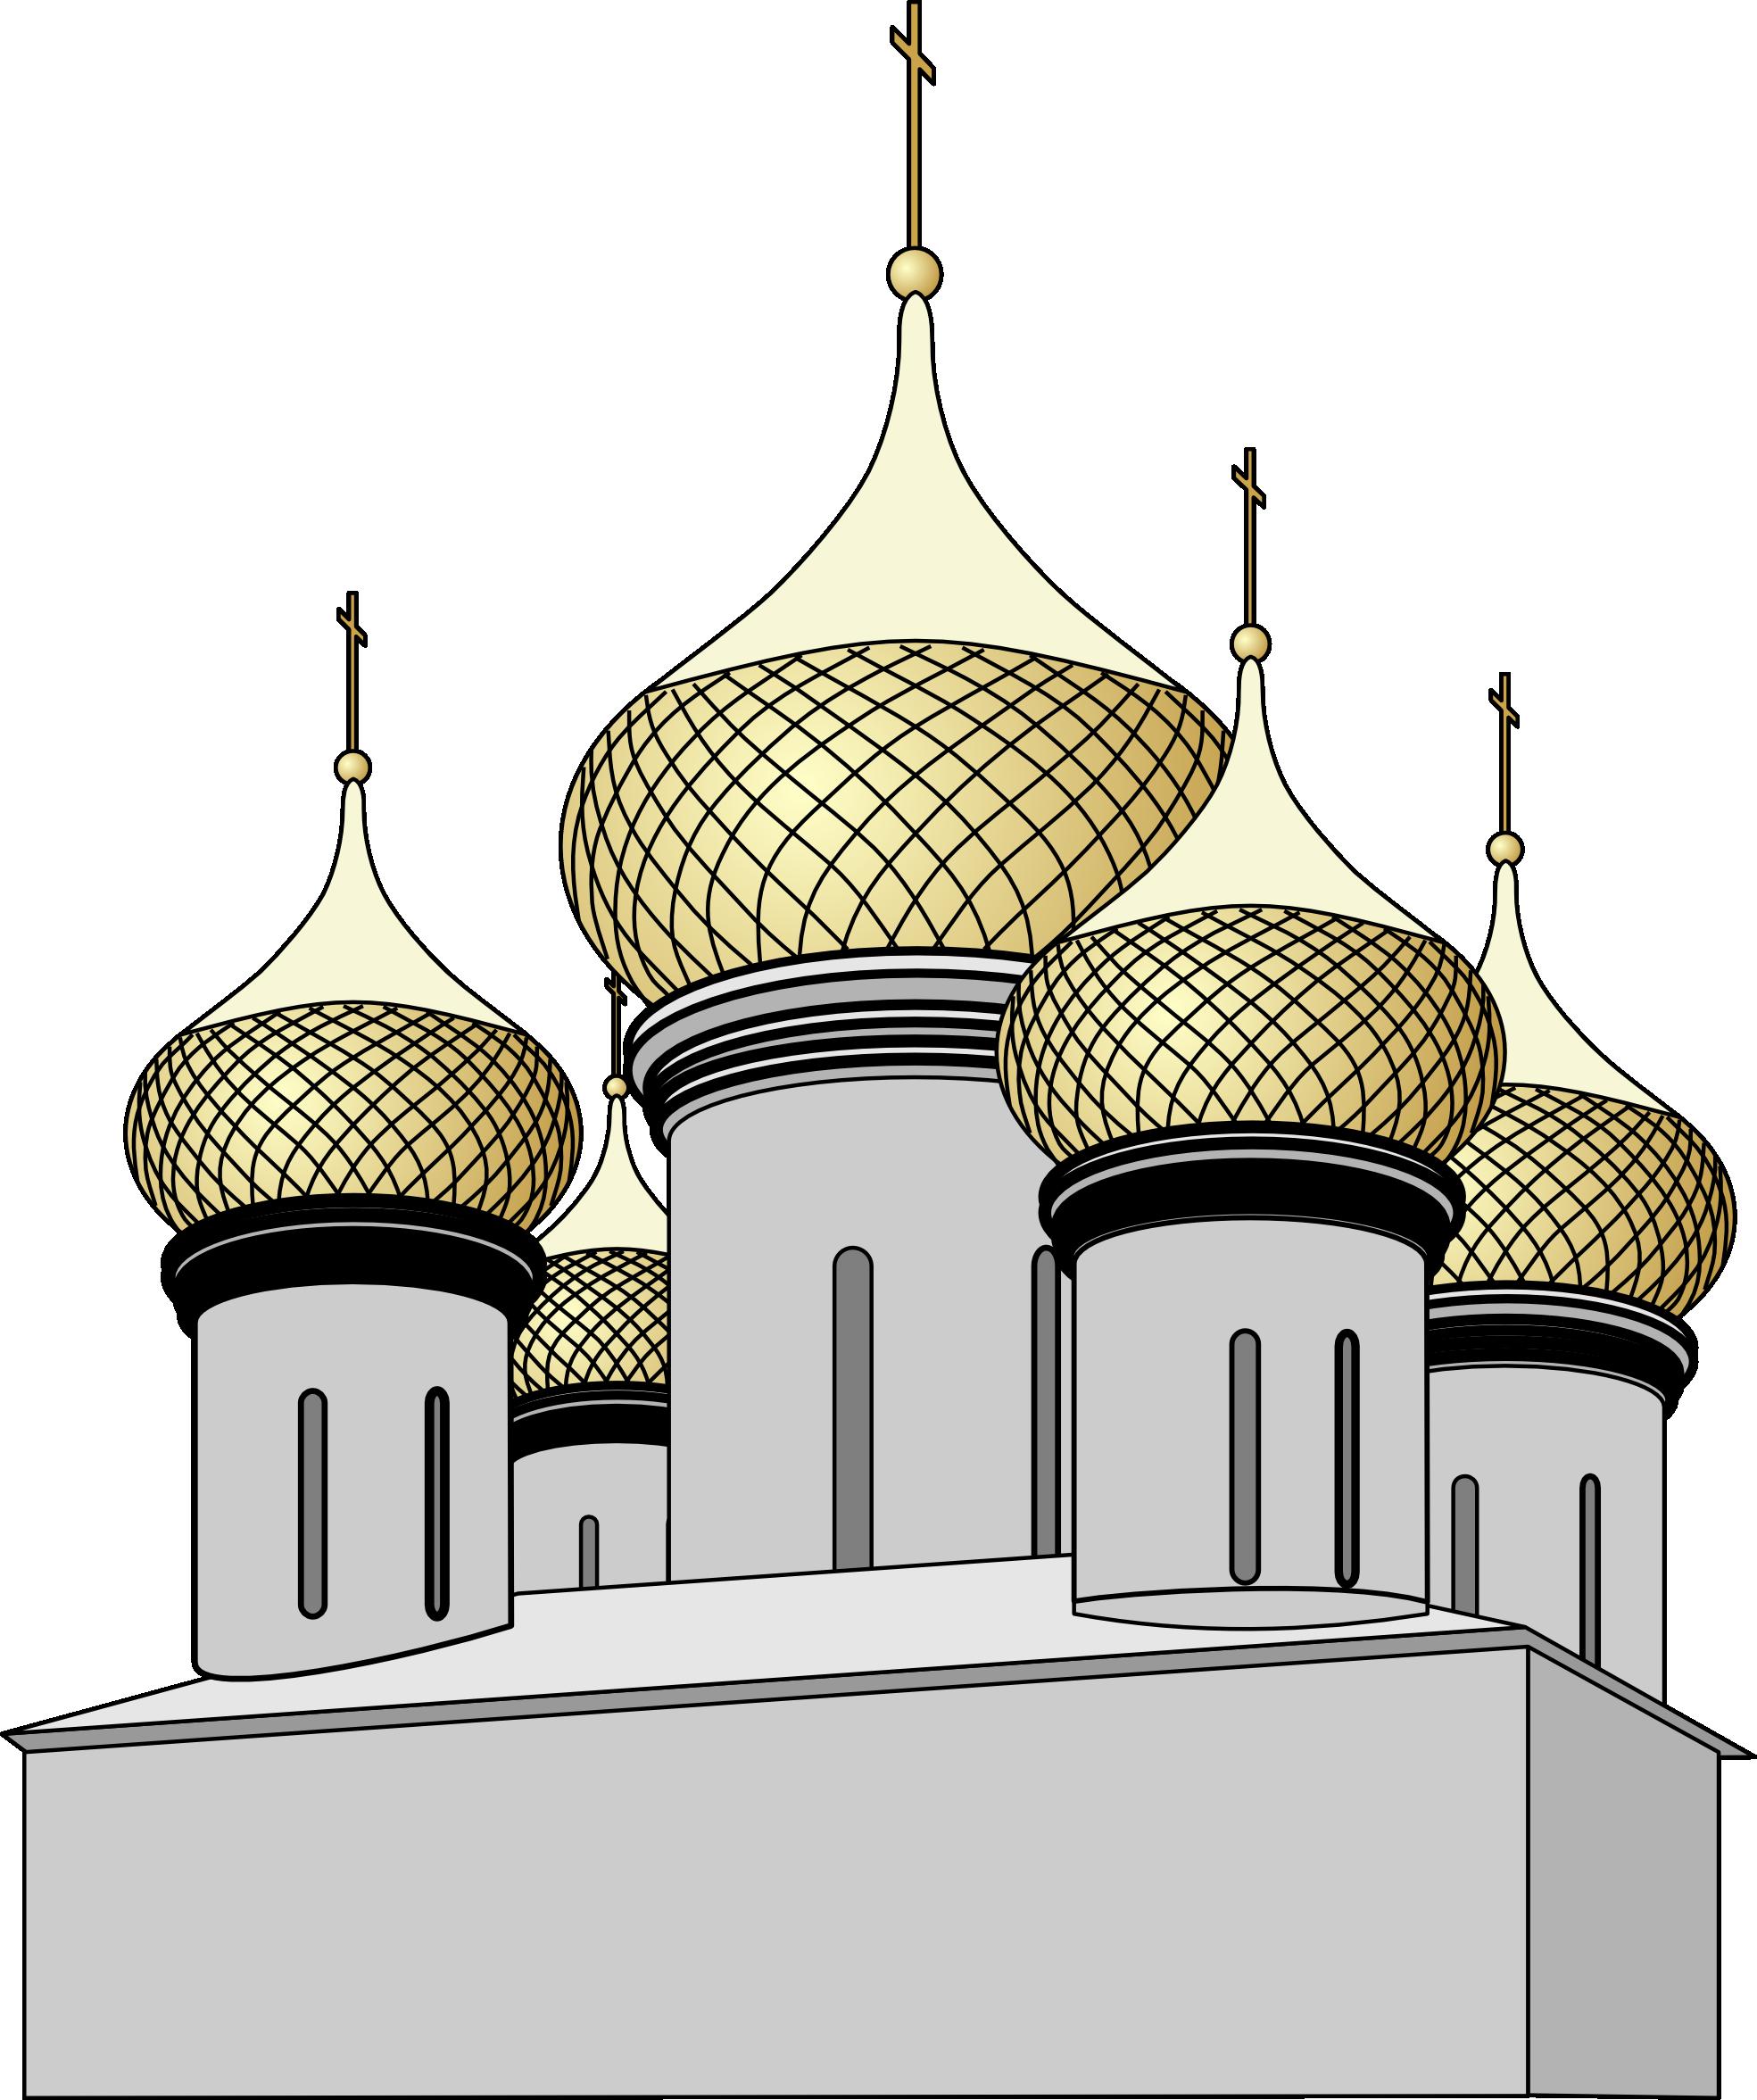 mosque clipart - Mosque Clipart